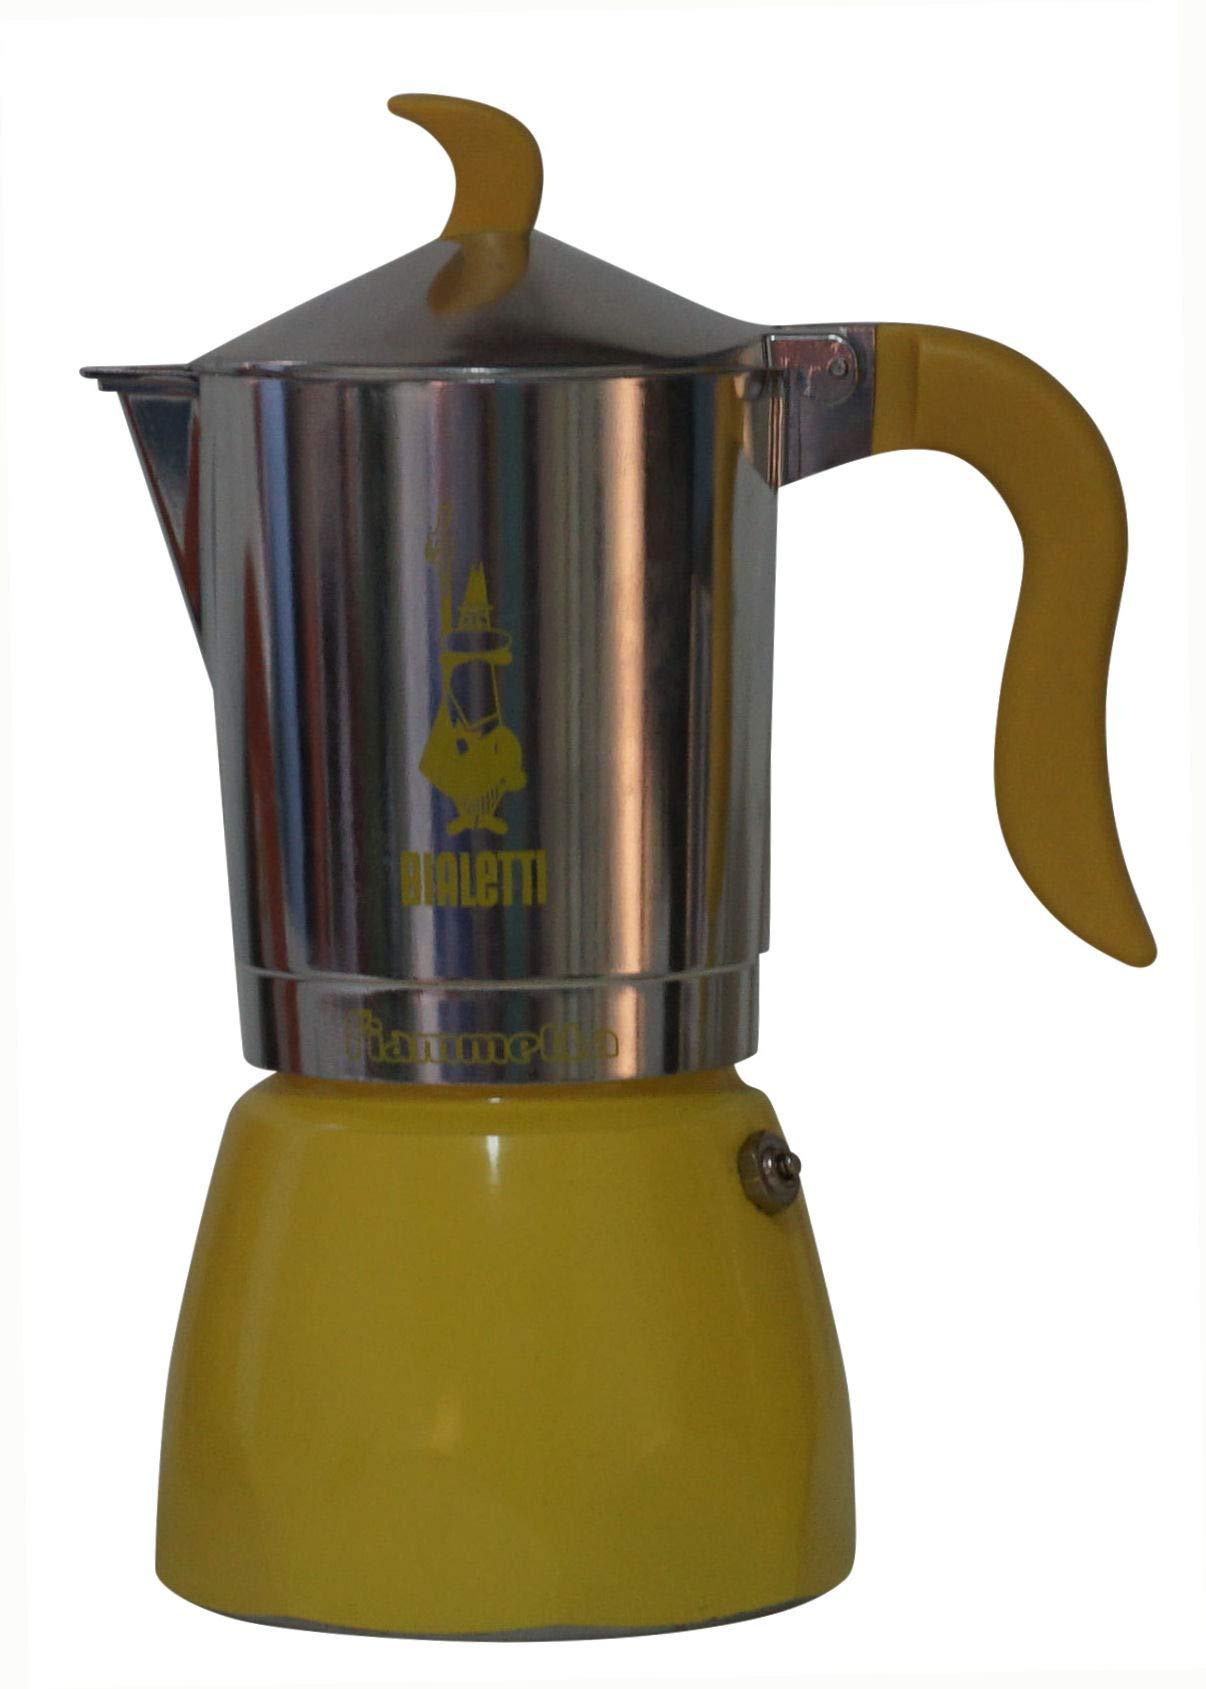 Bialetti:''Fiammetta'' Colours 6-Cups Yellow, New Ergonomic Shape for Handle and Knob [ Italian Import ]